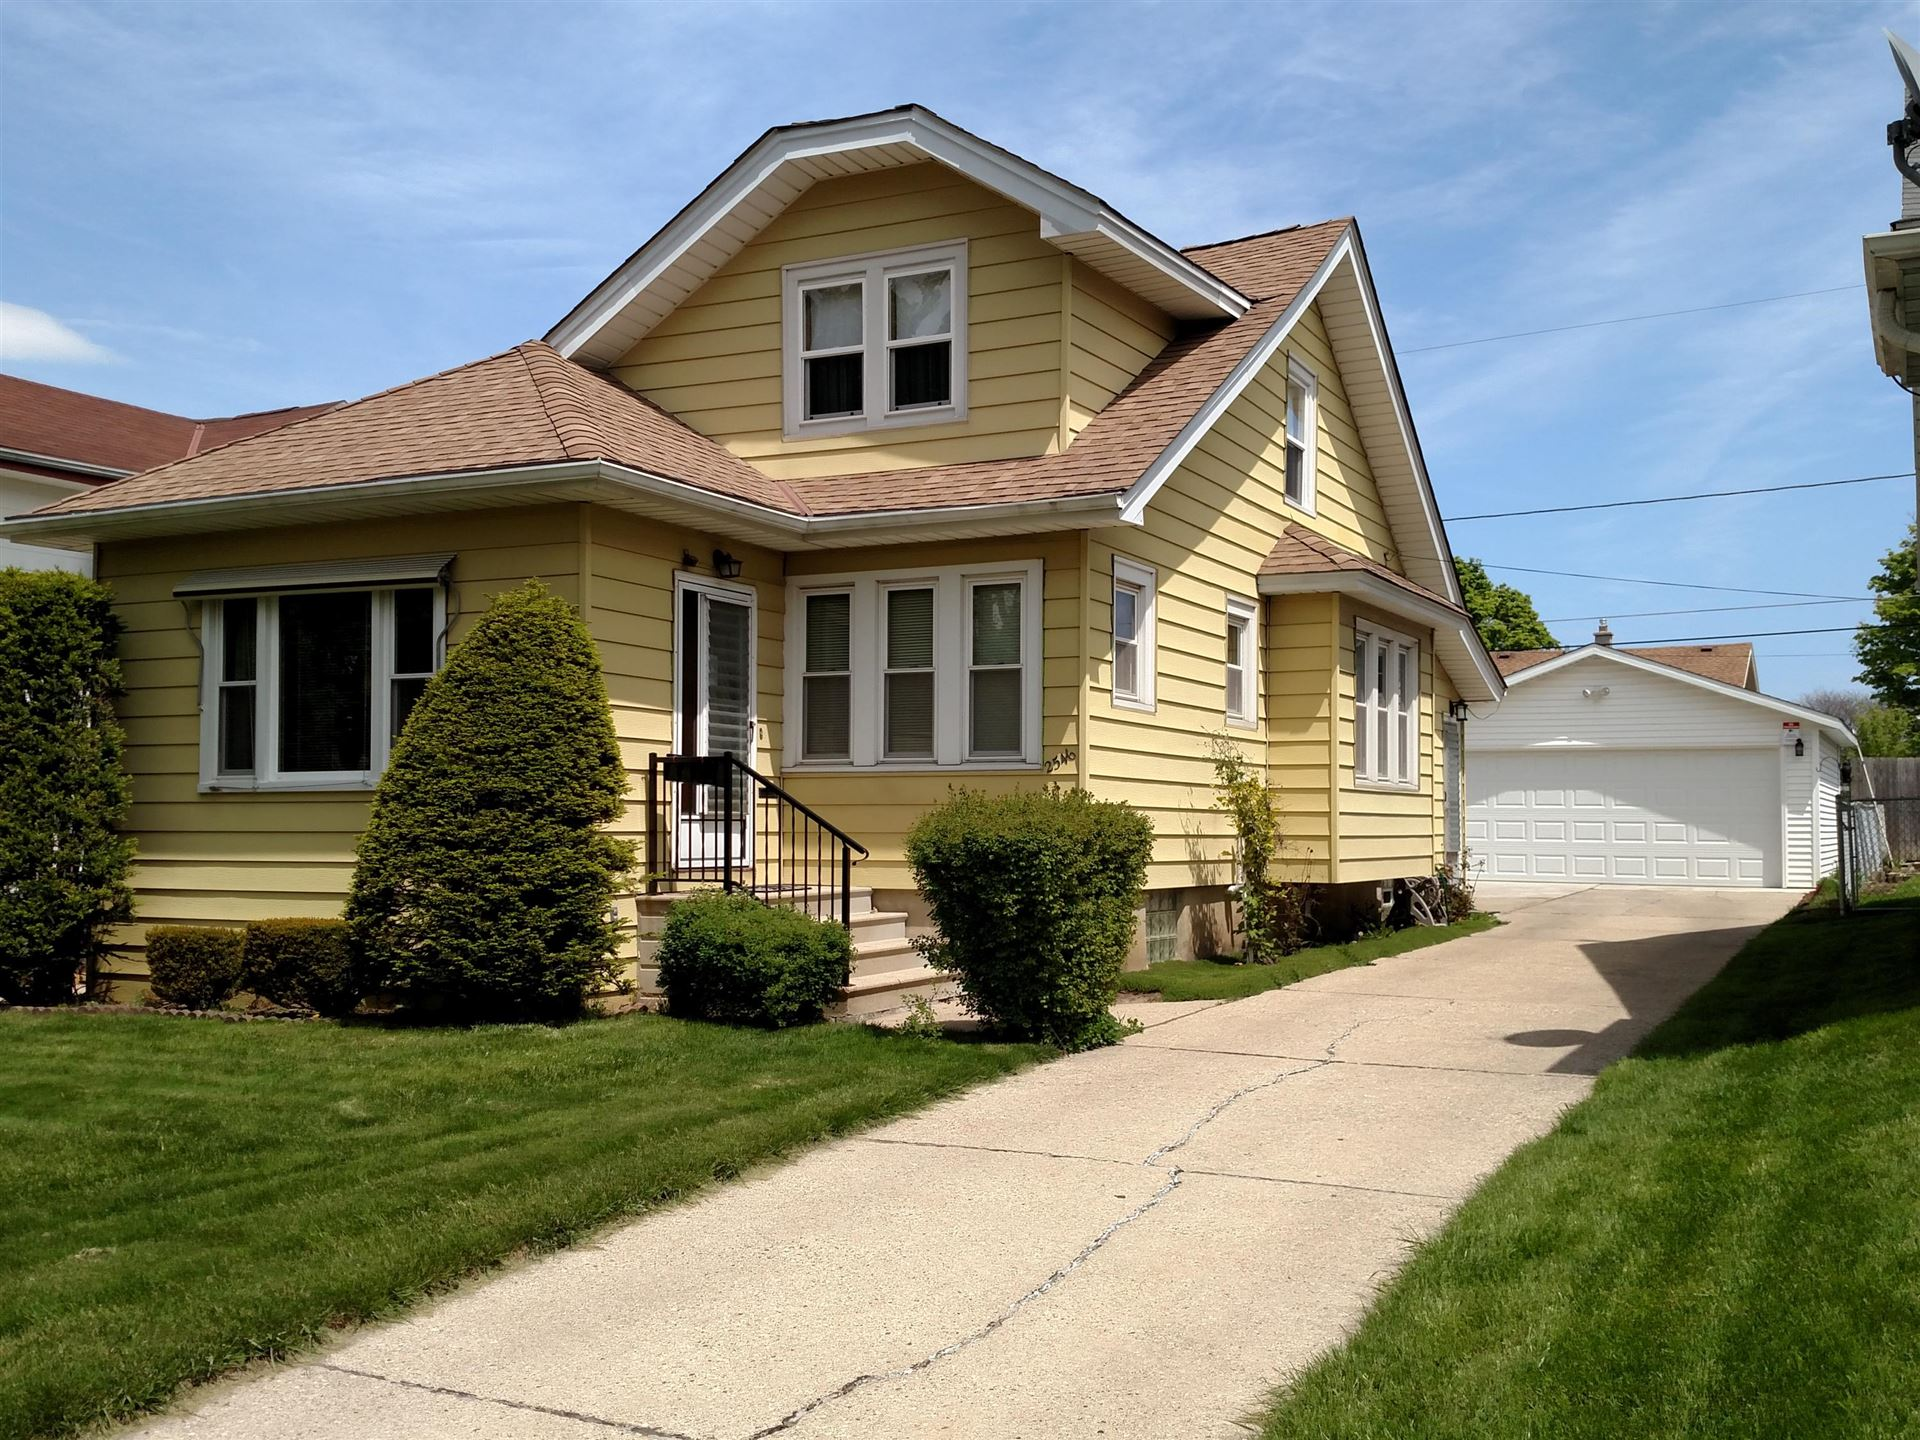 2546 N 59th St, Milwaukee, WI 53210 - #: 1693559